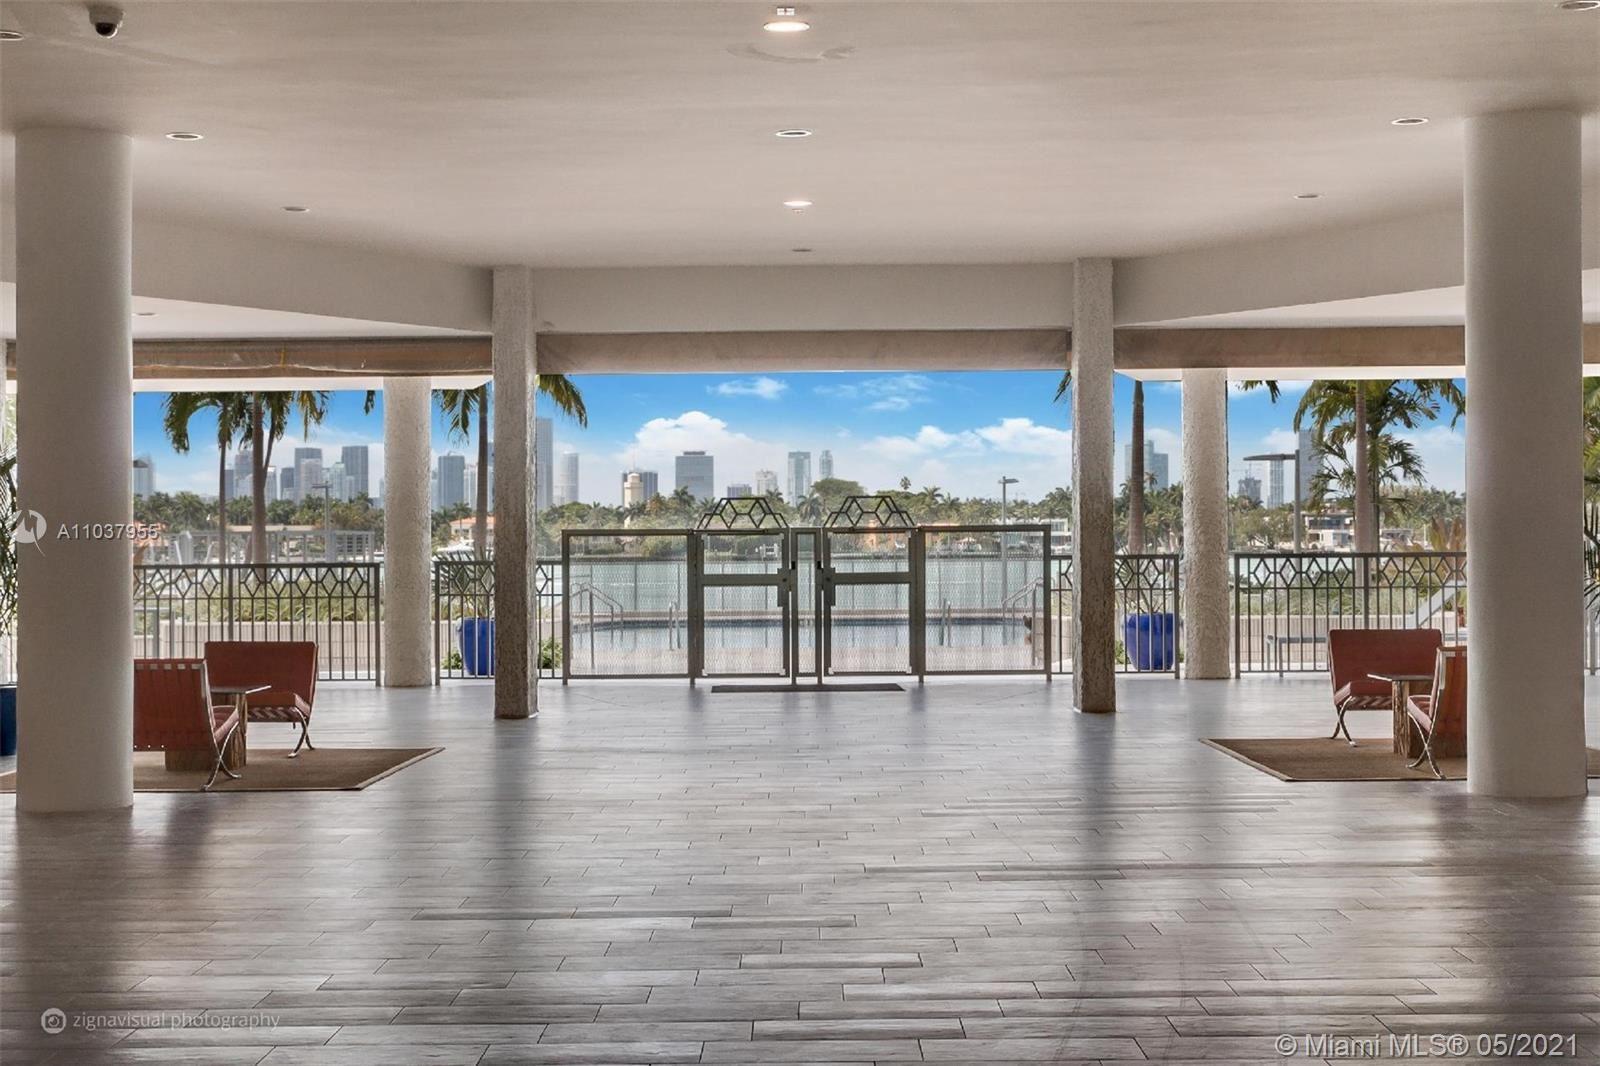 800 West Ave #334, Miami Beach, FL 33139 - #: A11037955